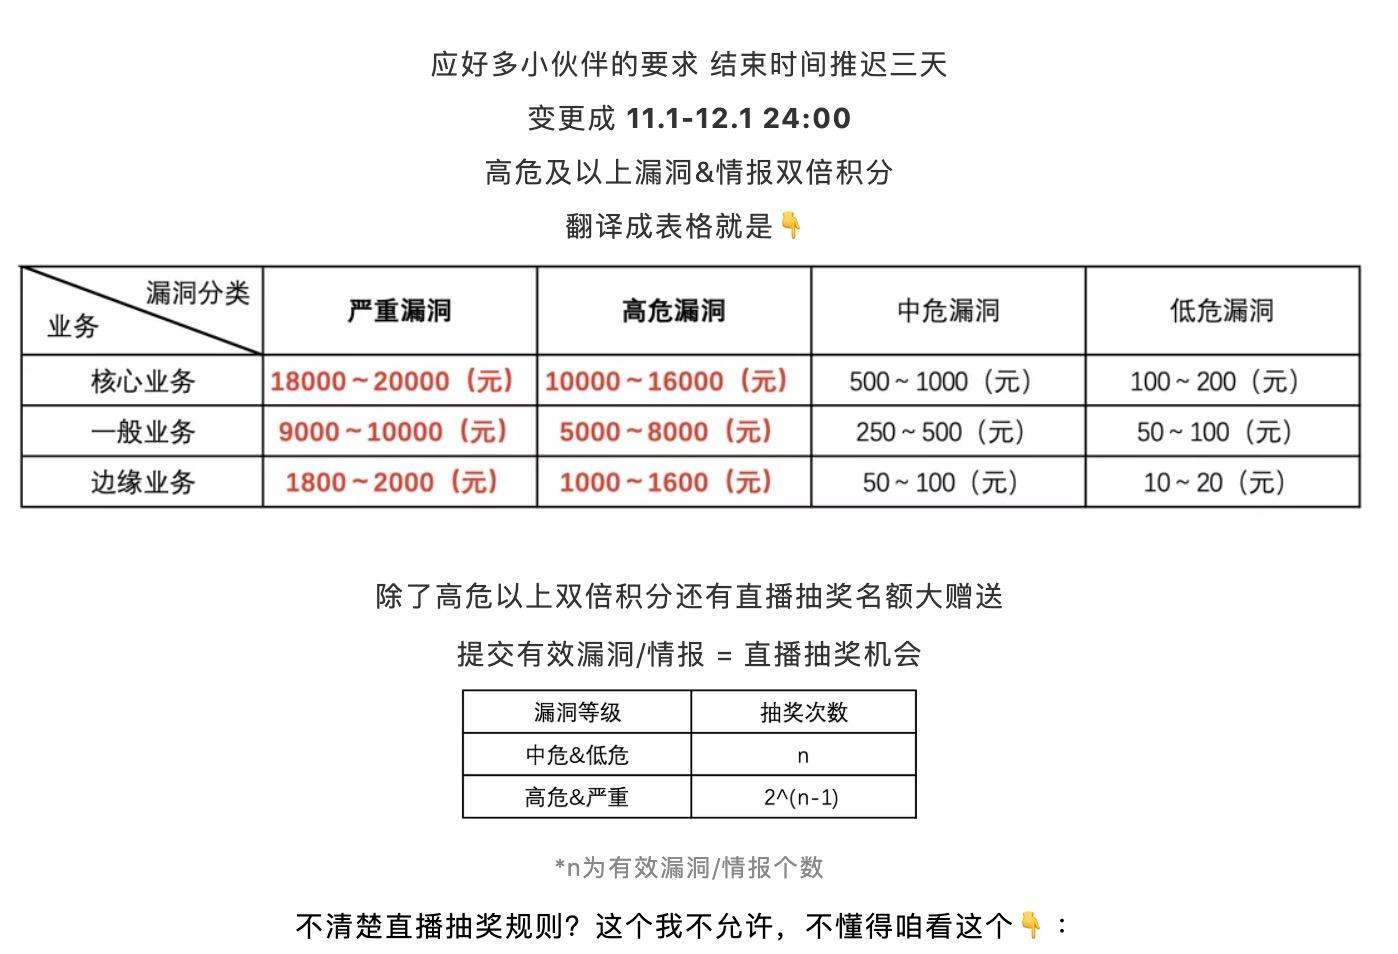 https://momo-mmsrc.oss-cn-hangzhou.aliyuncs.com/img-643ad30b-fe00-3279-9c19-ffc607cddc9f.jpeg